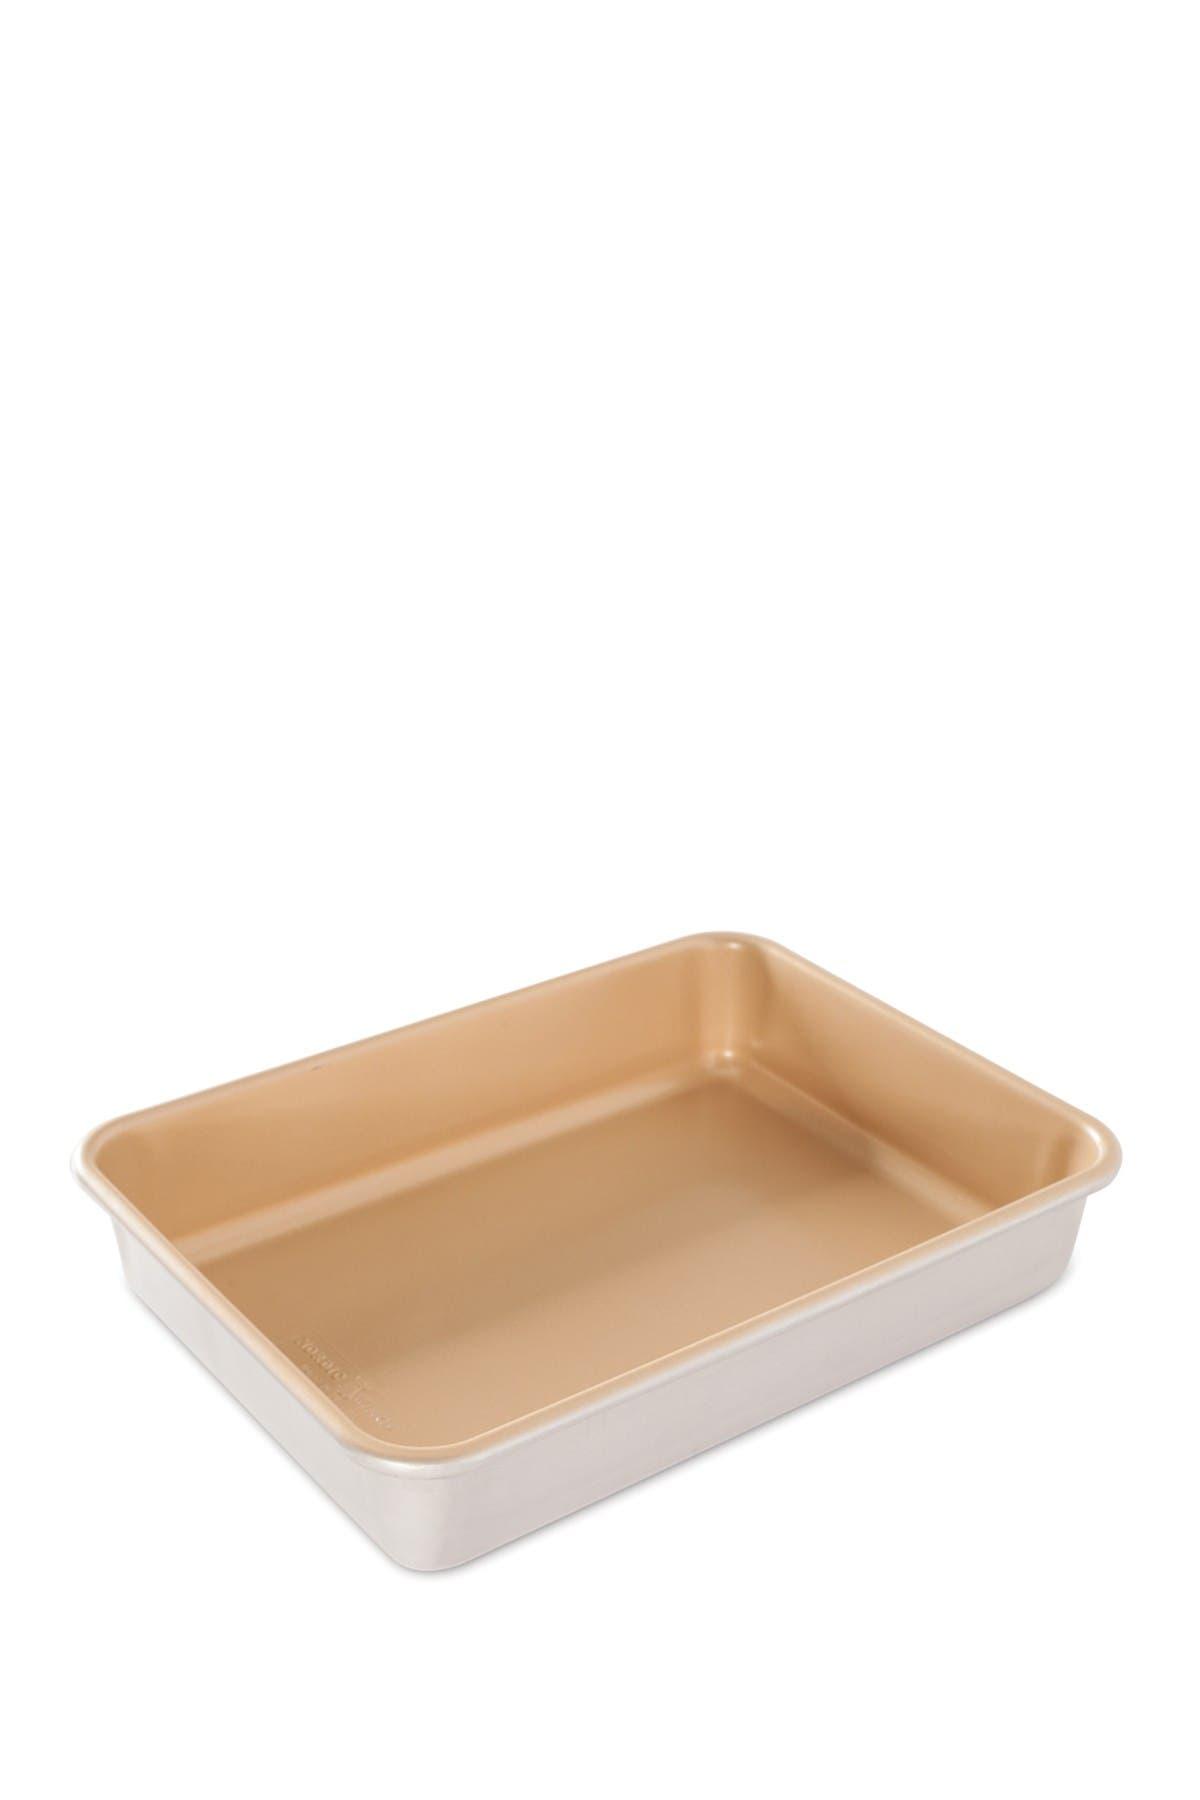 "Image of Nordic Ware Naturals Nonstick 9"" x 13"" Rectangular Cake Pan"